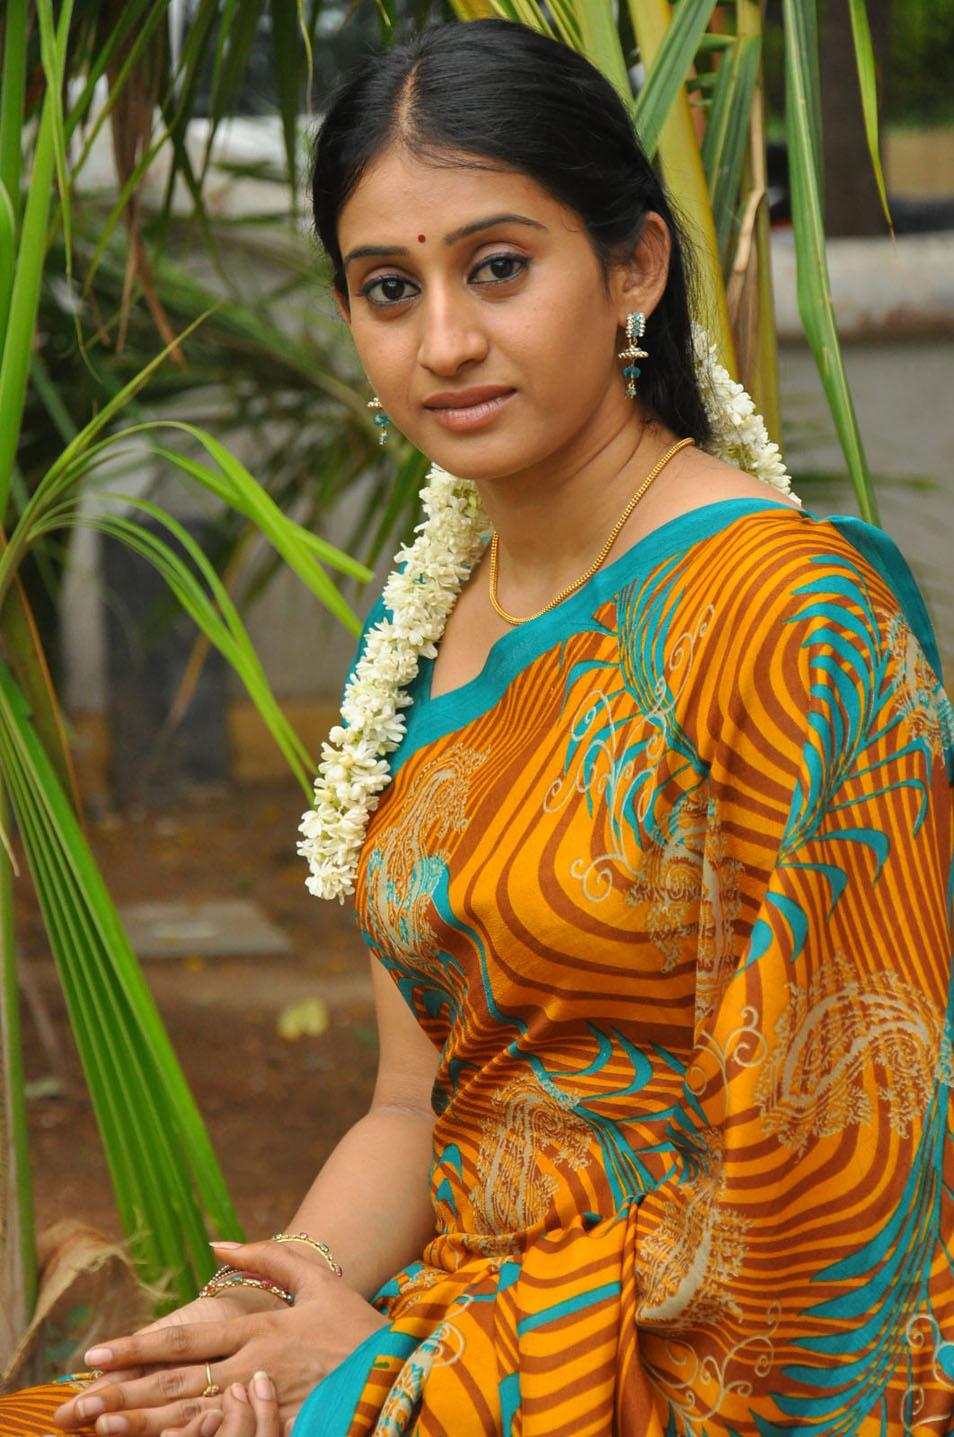 https://www.ragalahari.com/actress/167108/chandana